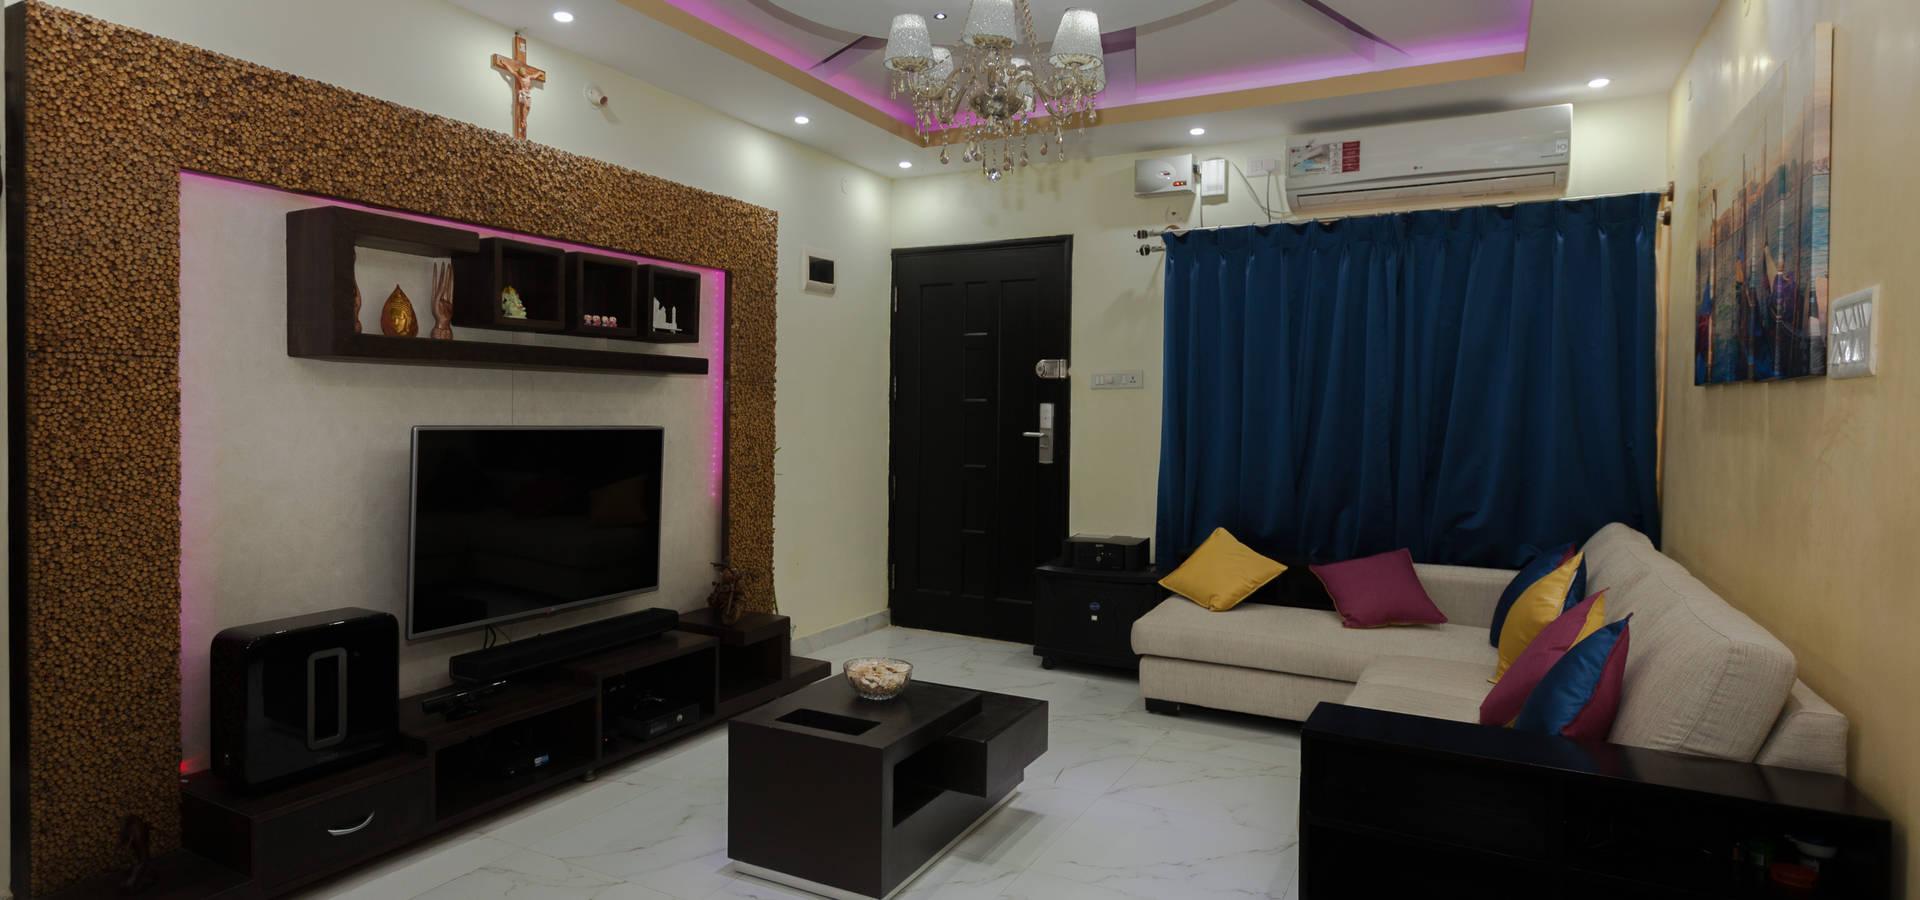 Kriyartive Interior Design